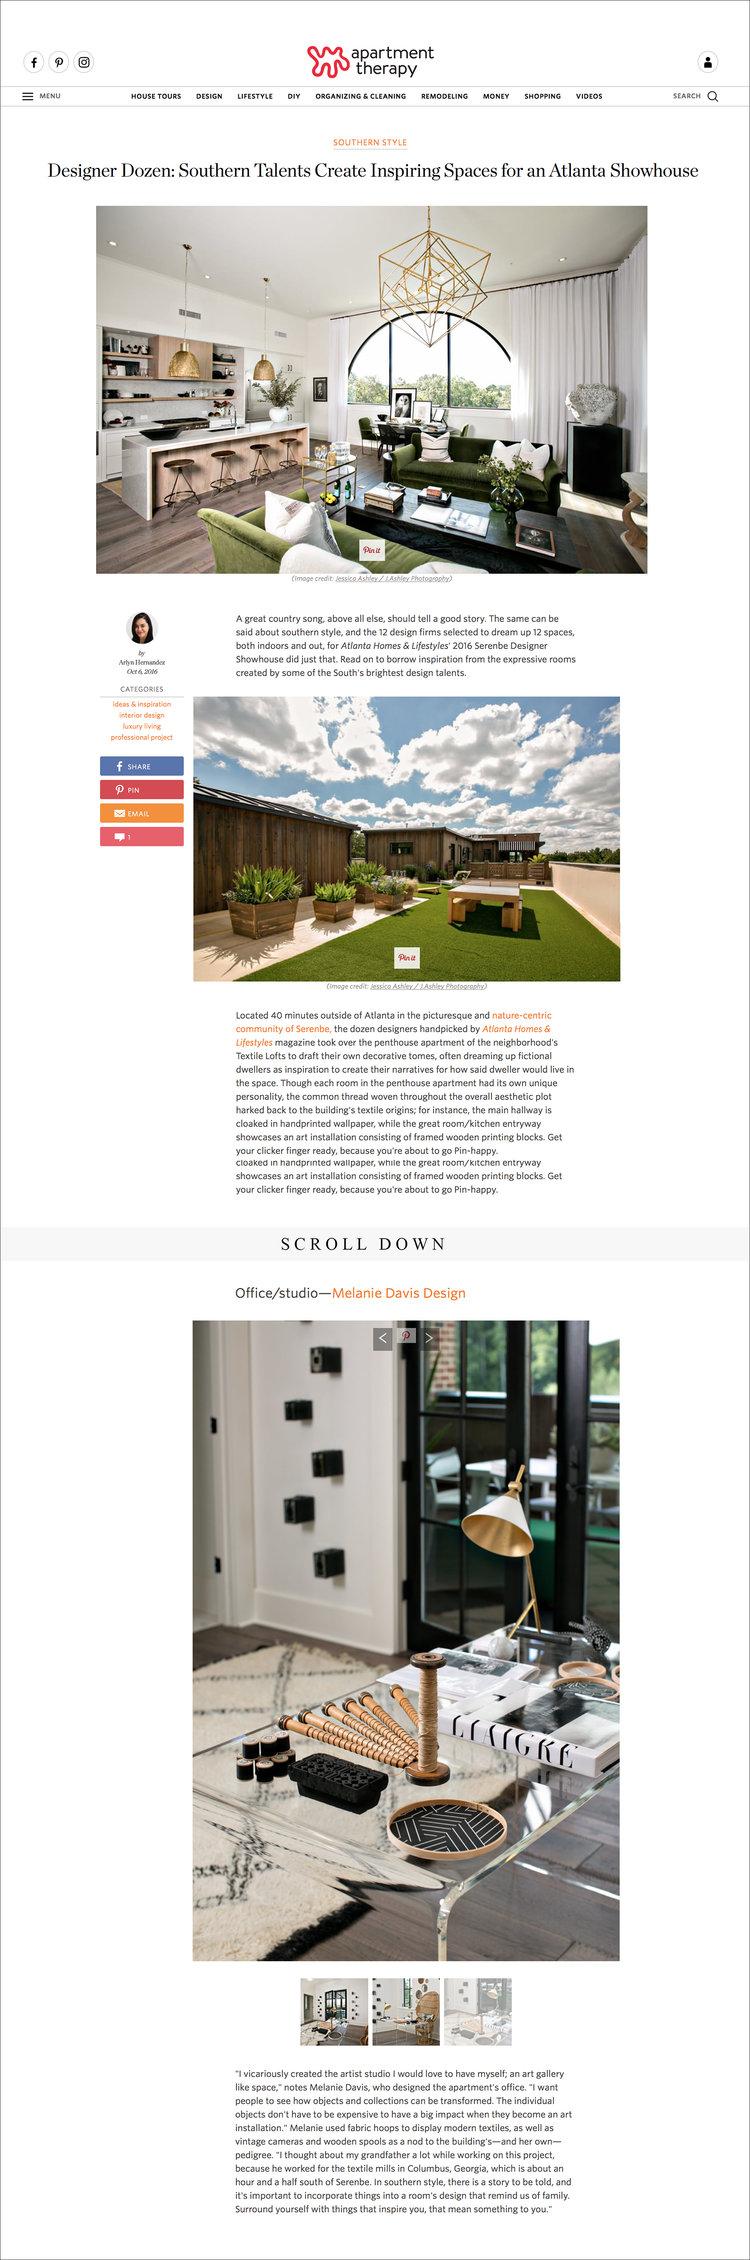 Melanie Davis Design Bracey Apartment Therapy Interior Sept16 NaturallyInspired Instagram R1